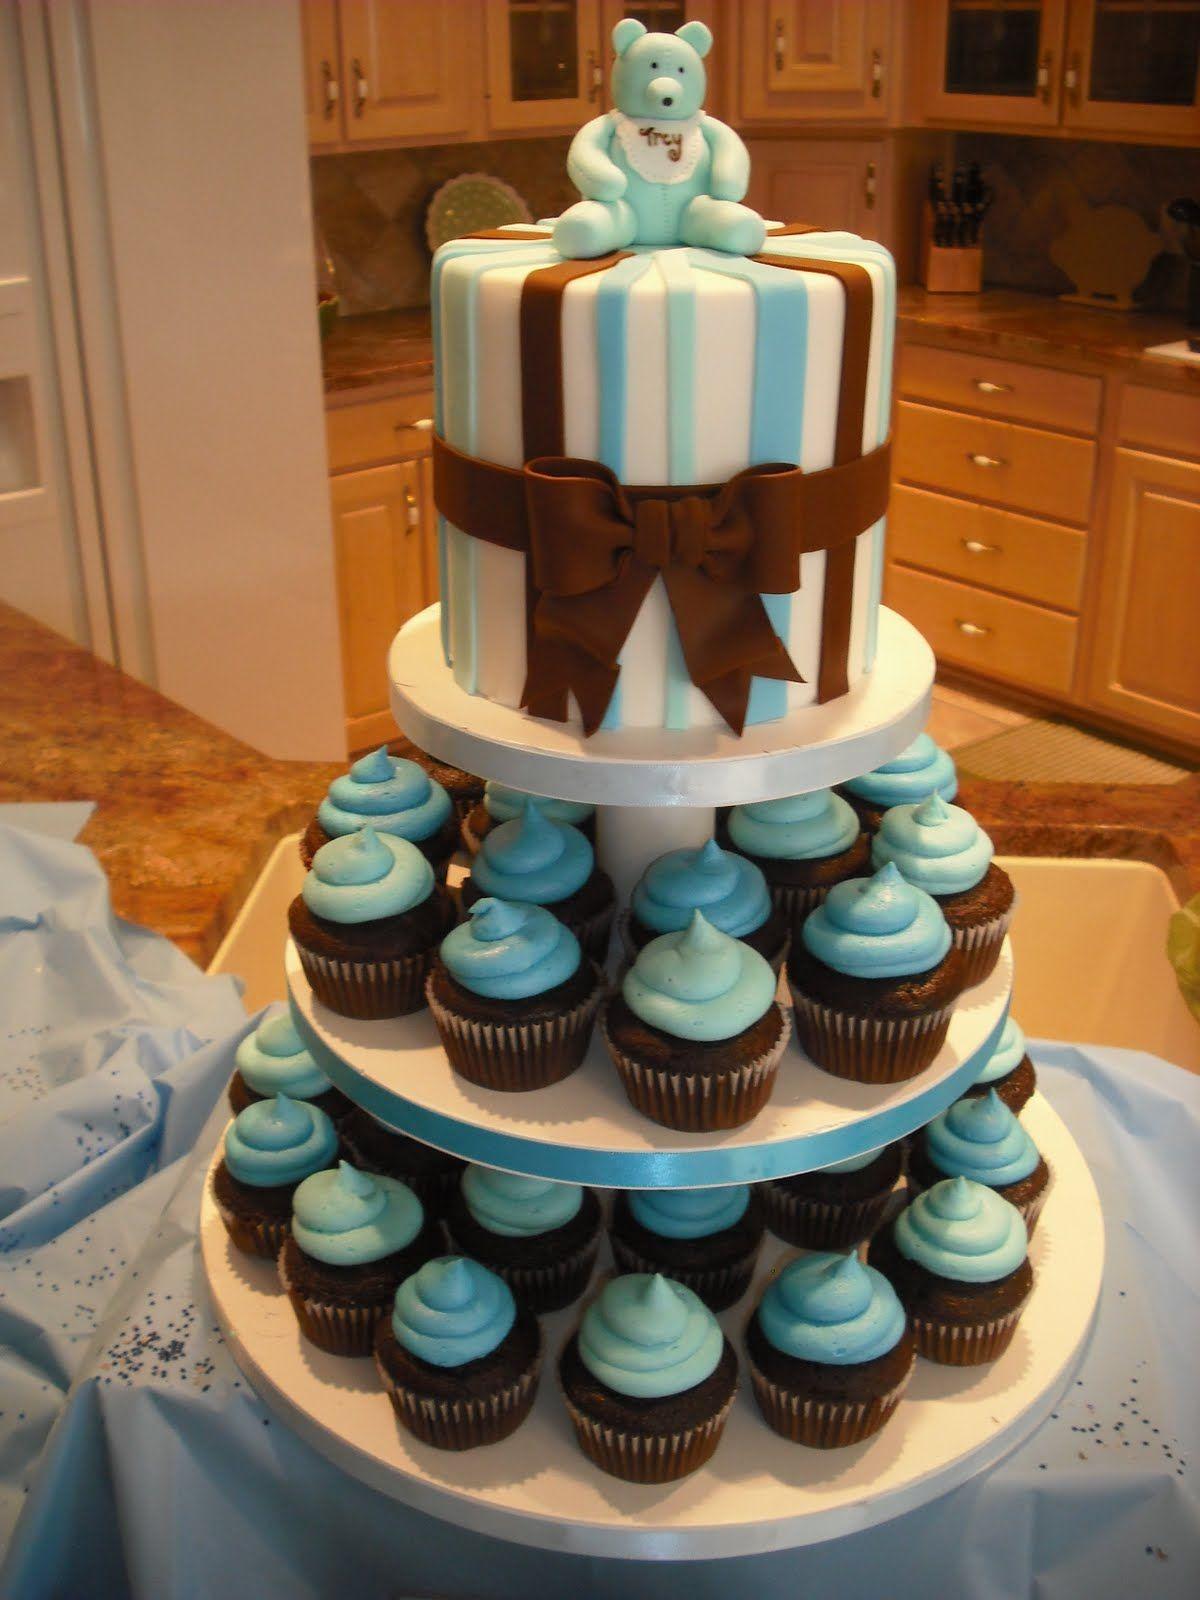 Baby Shower Cake Ideas Boy : shower, ideas, Sprinklebelle:, Shower, Cake/Cupcake, Tower, Cakes, Boys,, Cupcake, Cake,, Cupcakes